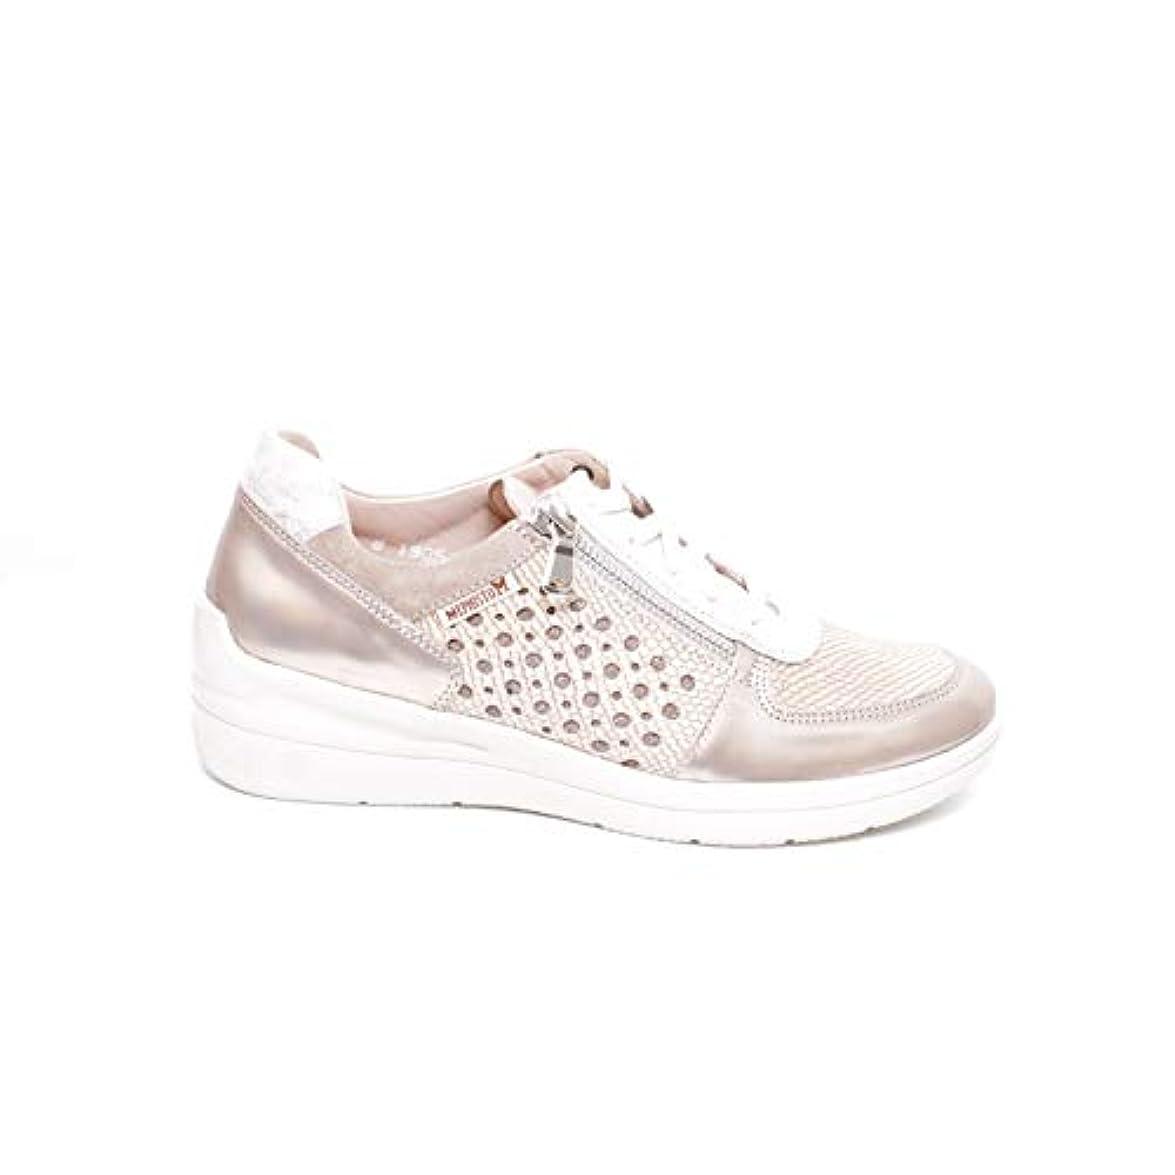 Mephisto - Sneaker Donna Pelle